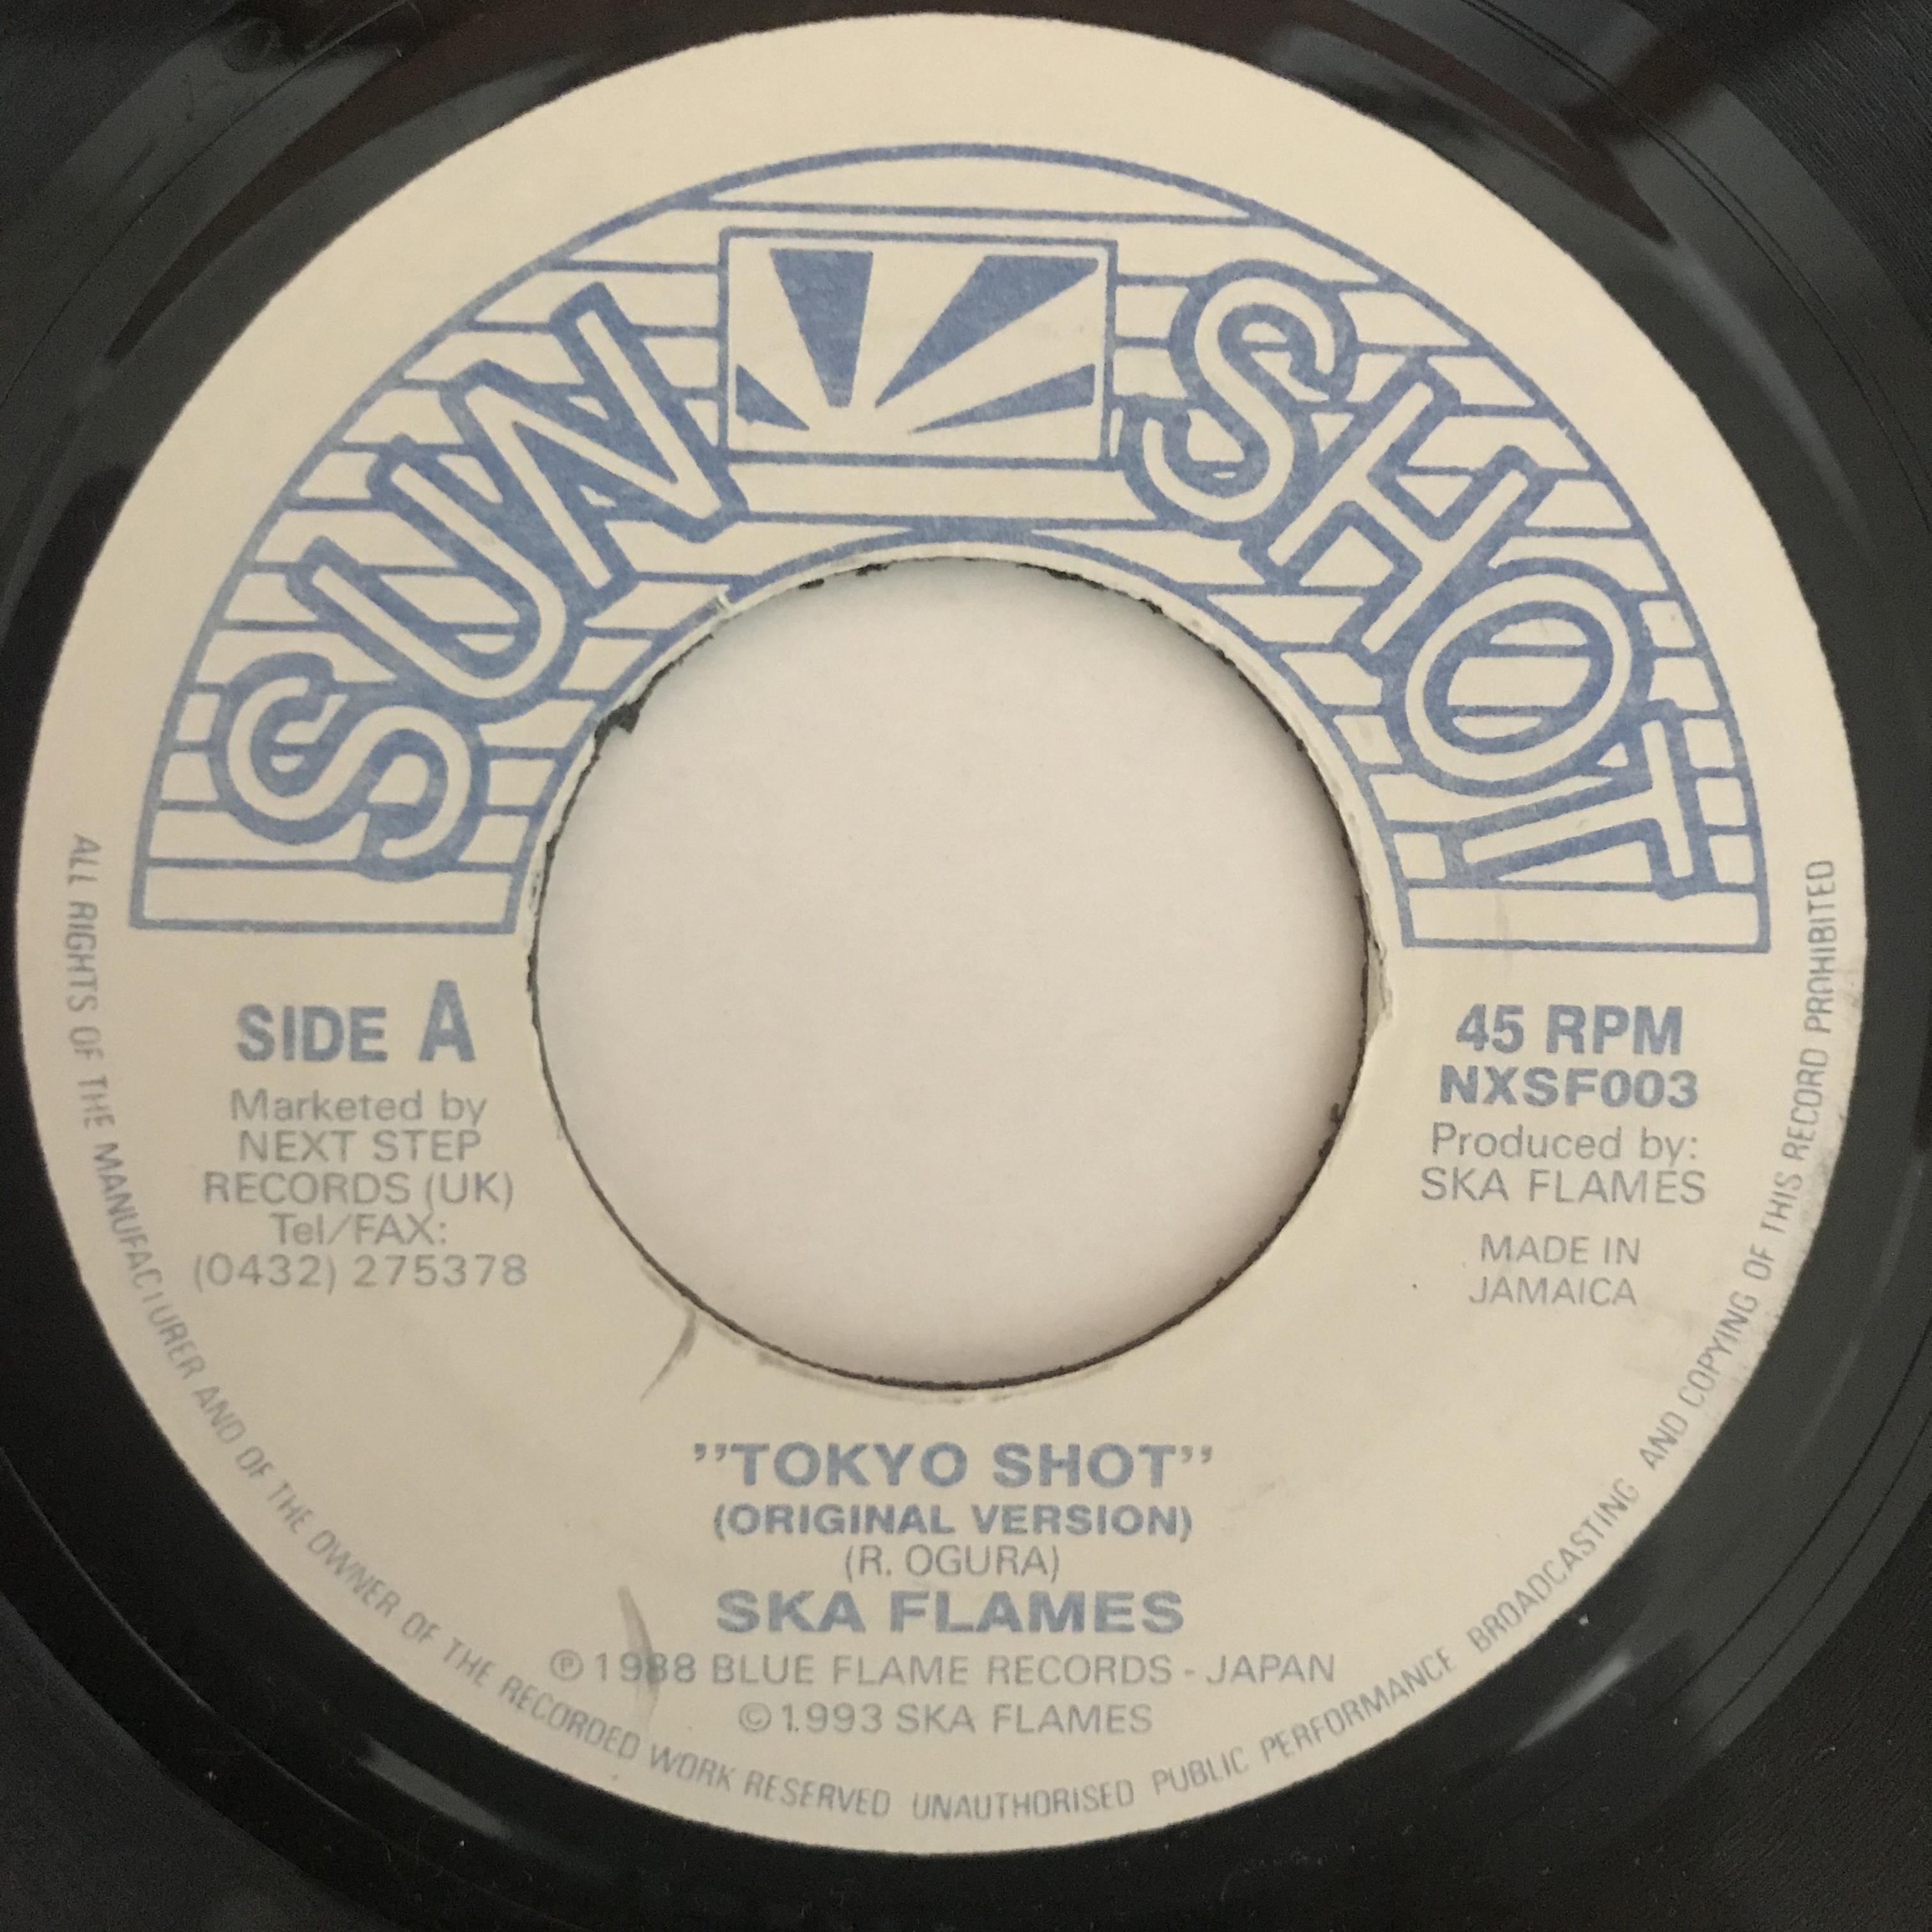 The Ska Flames - Tokyo Shot 【7-10883】